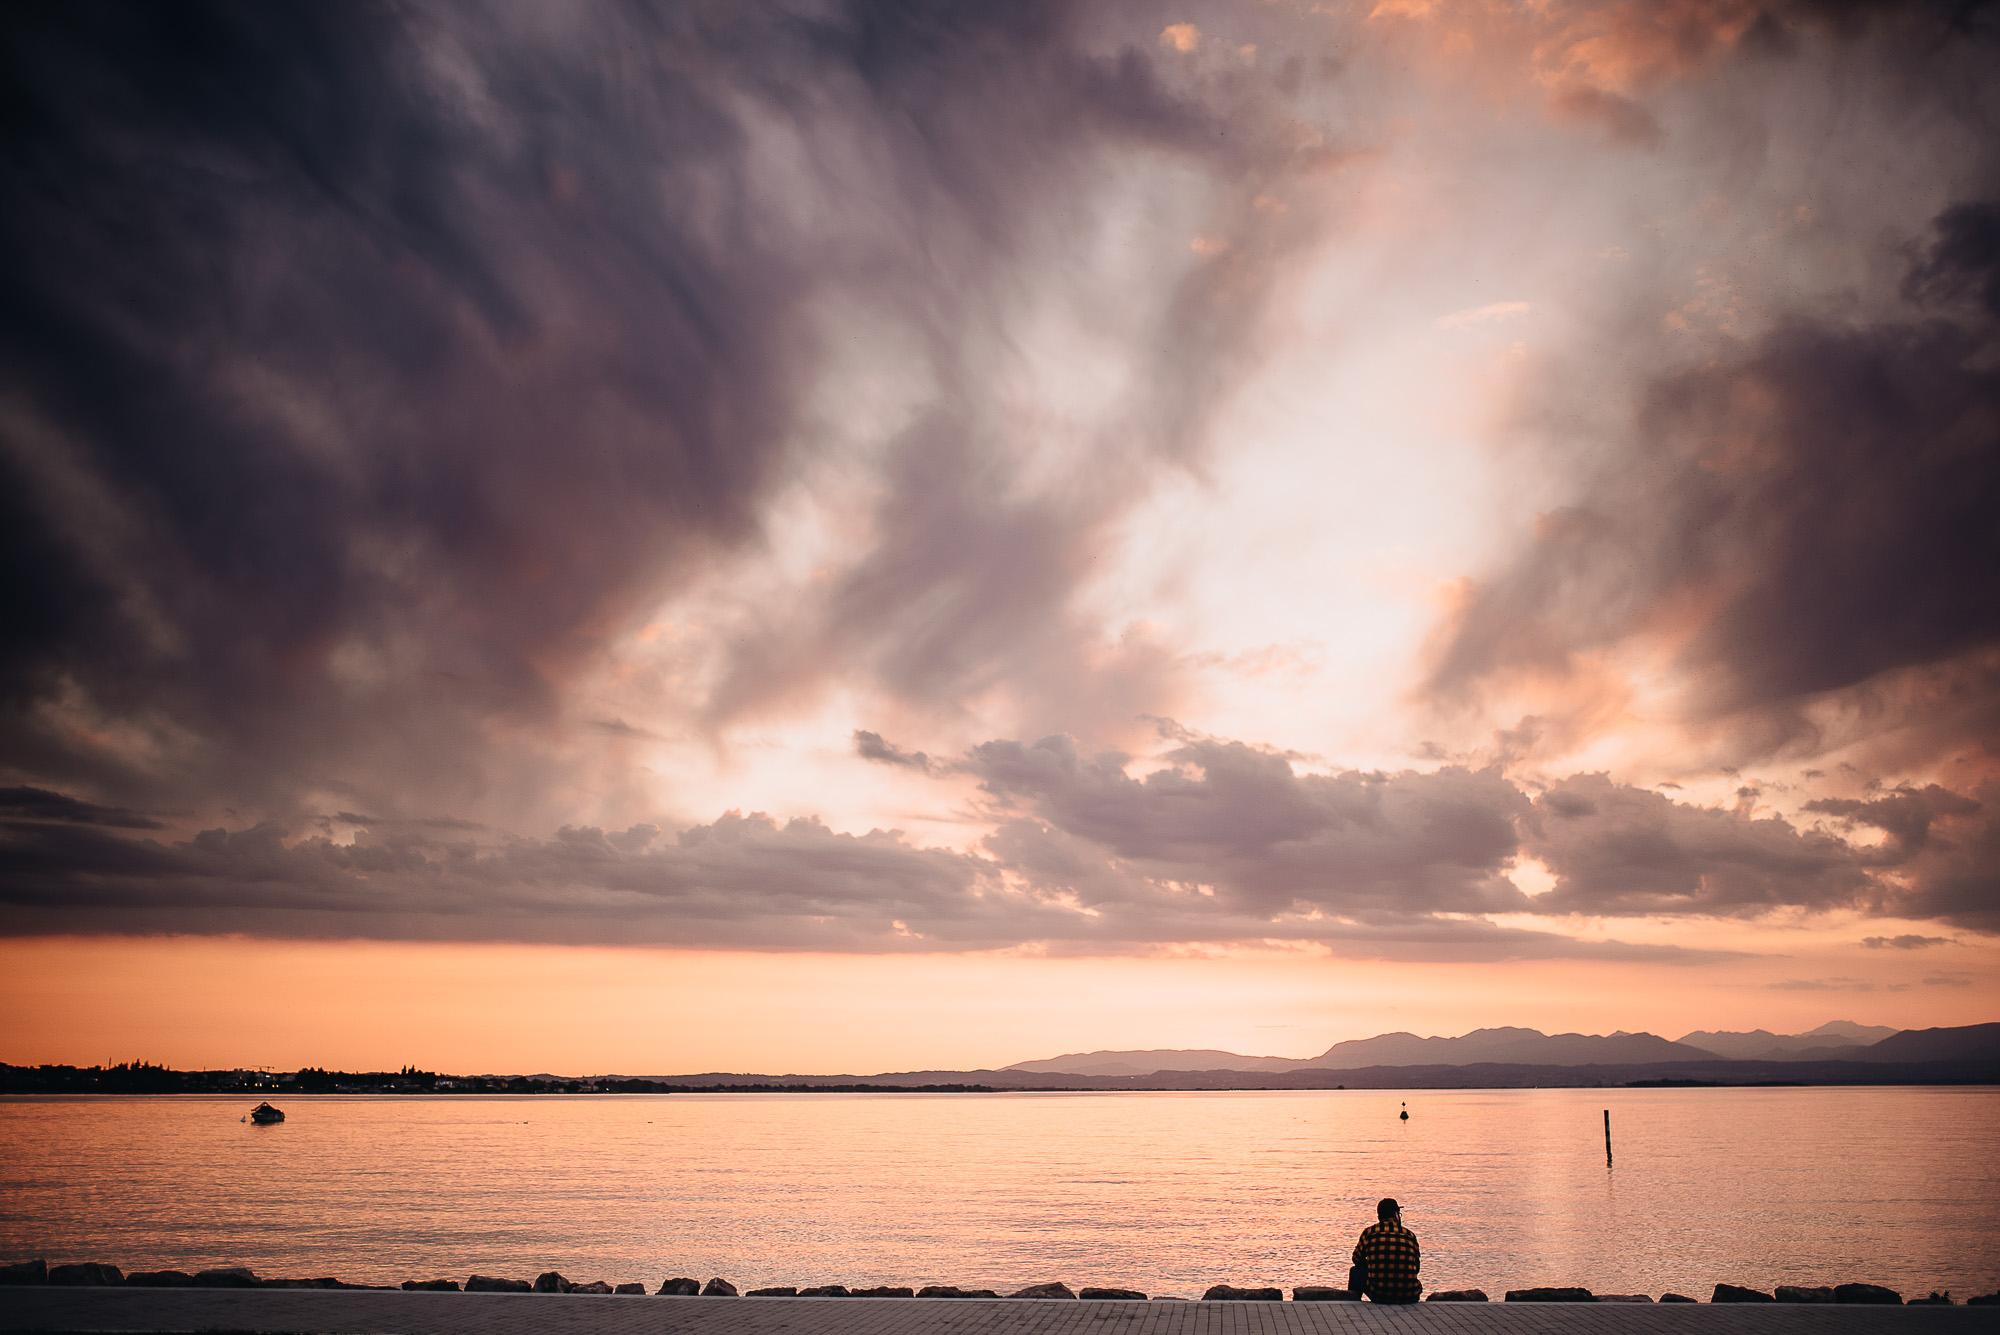 OurBeautifulAdventure-LakeGarda-Italy-Blog-1854.jpg